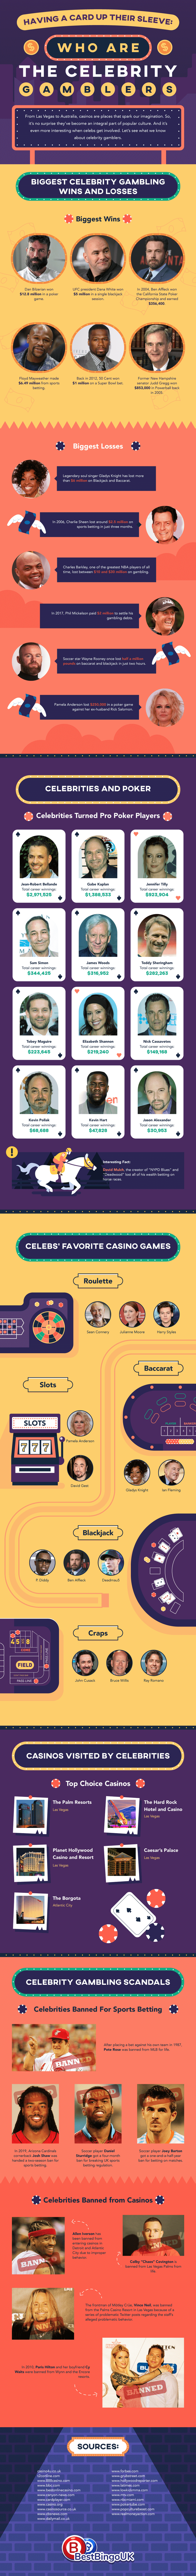 celebrity gamblers